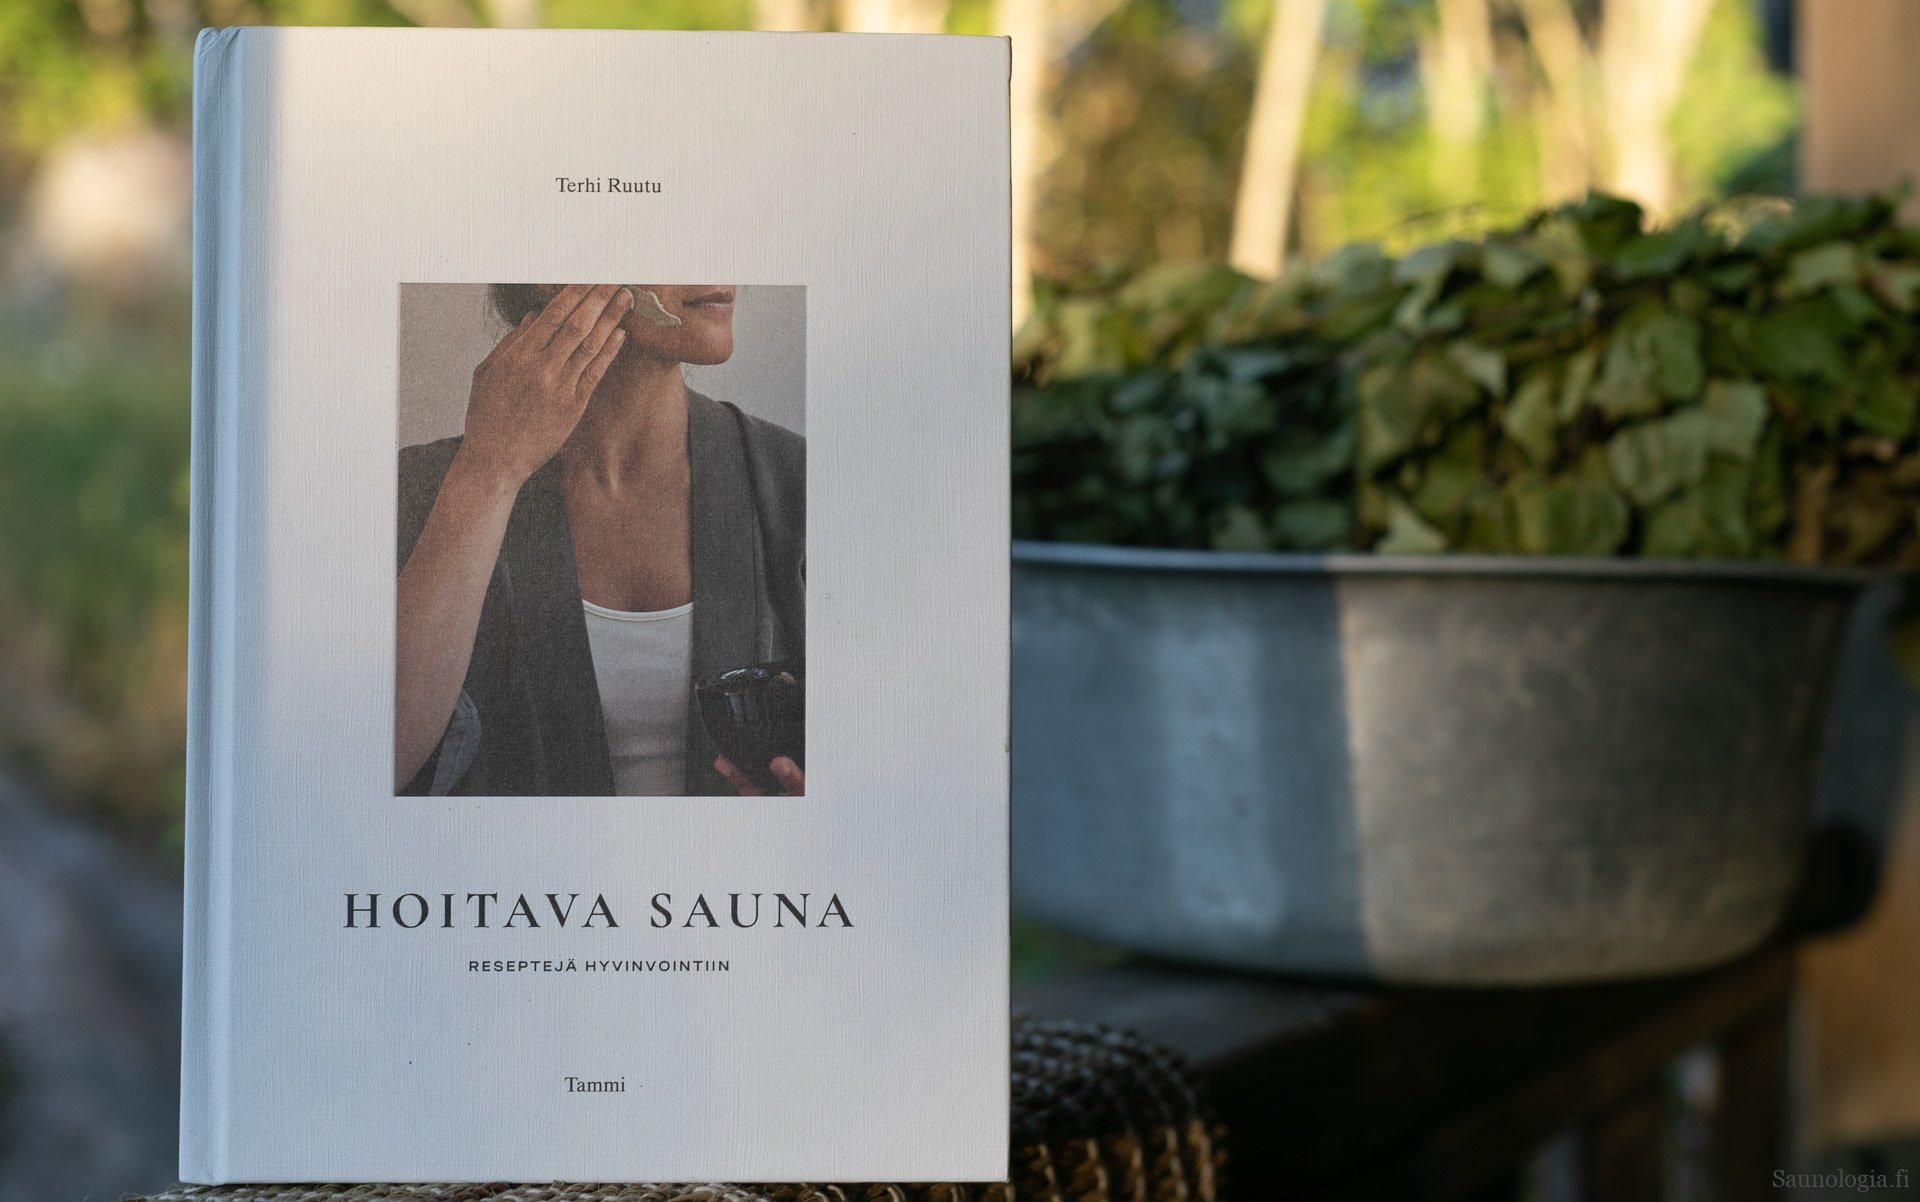 Kirjaesittely Terhi Ruutu Hoitava sauna